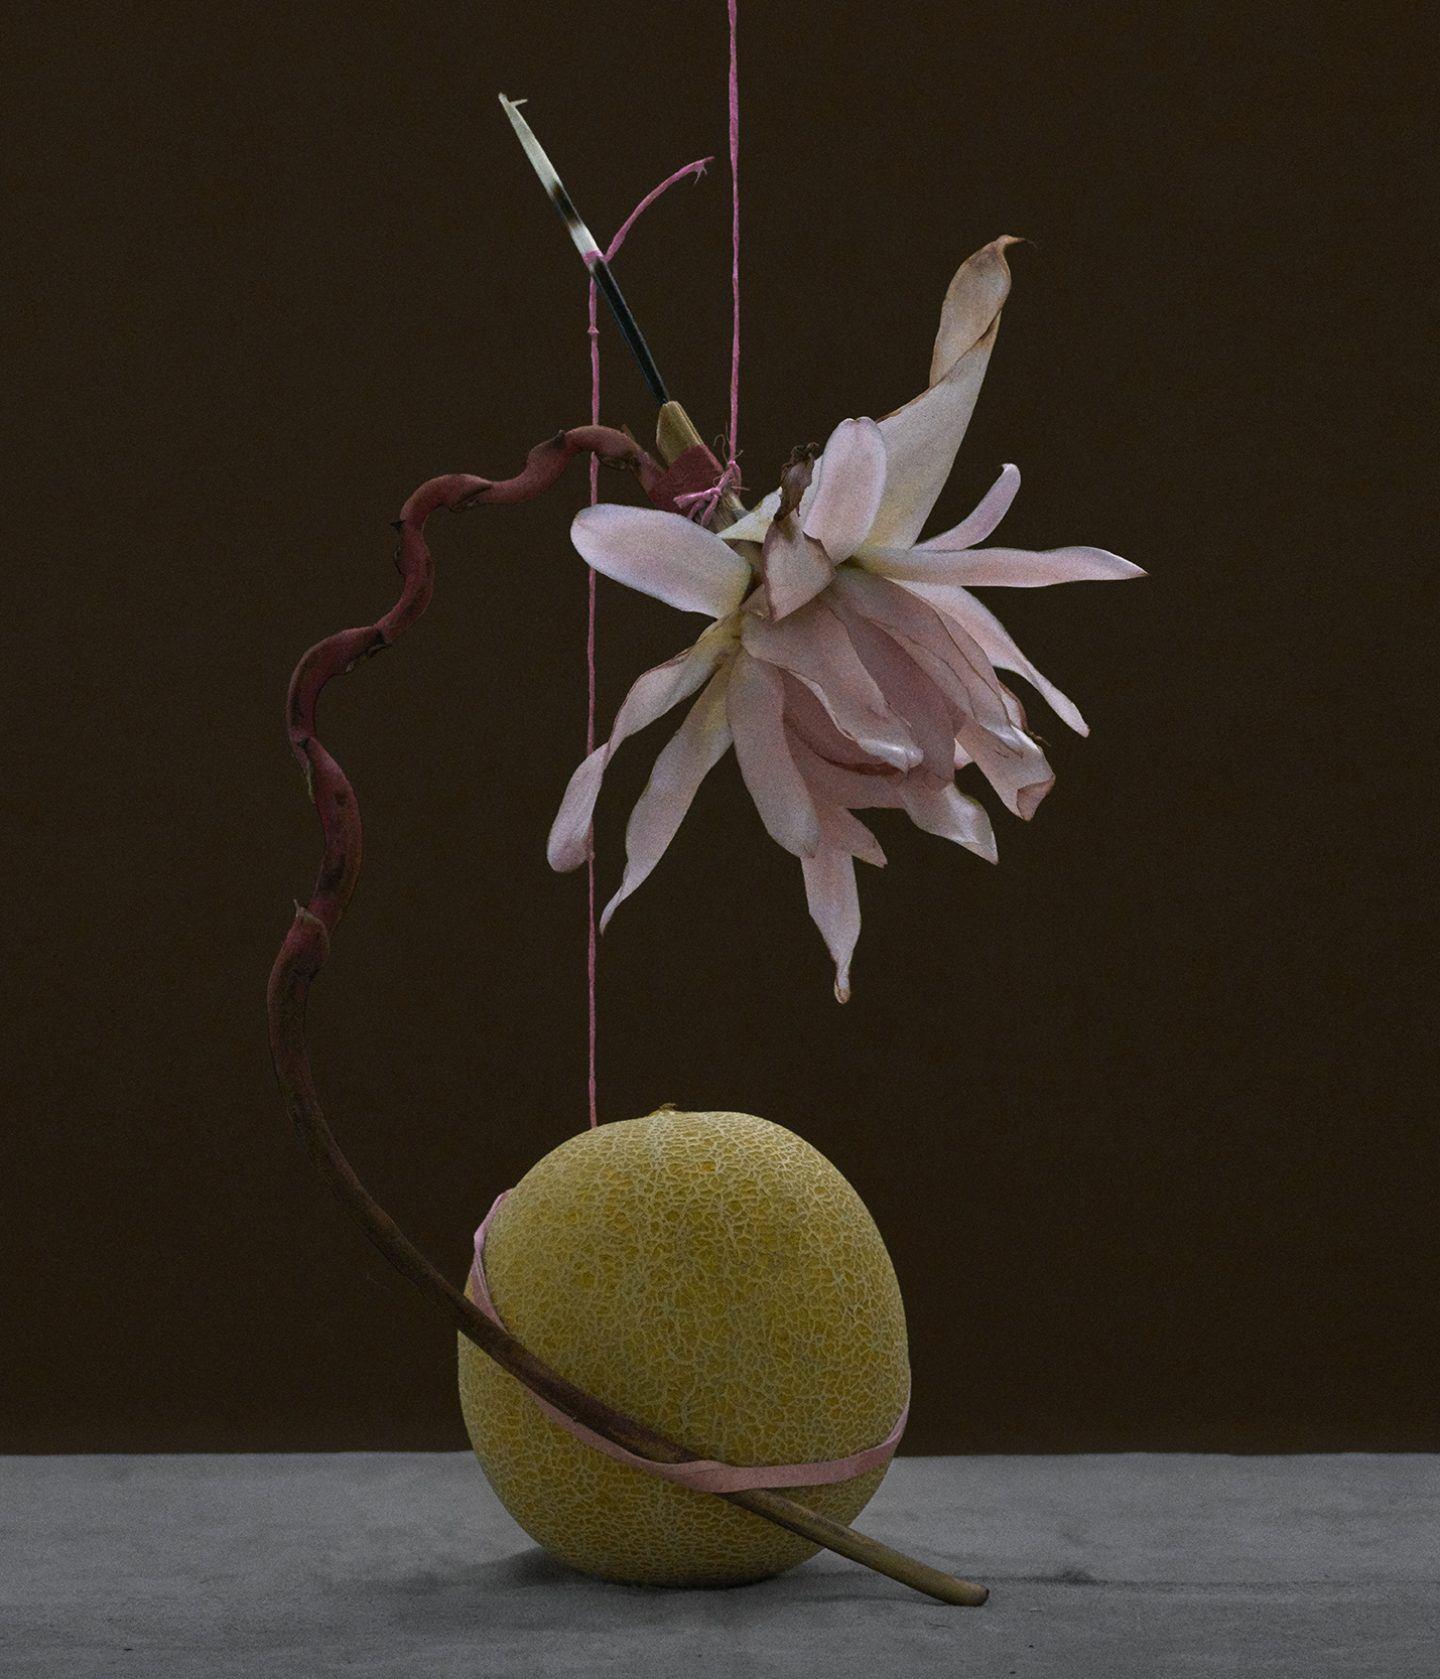 IGNANT-Photograpy-Donimik-Tarabanski-Roses-New-08